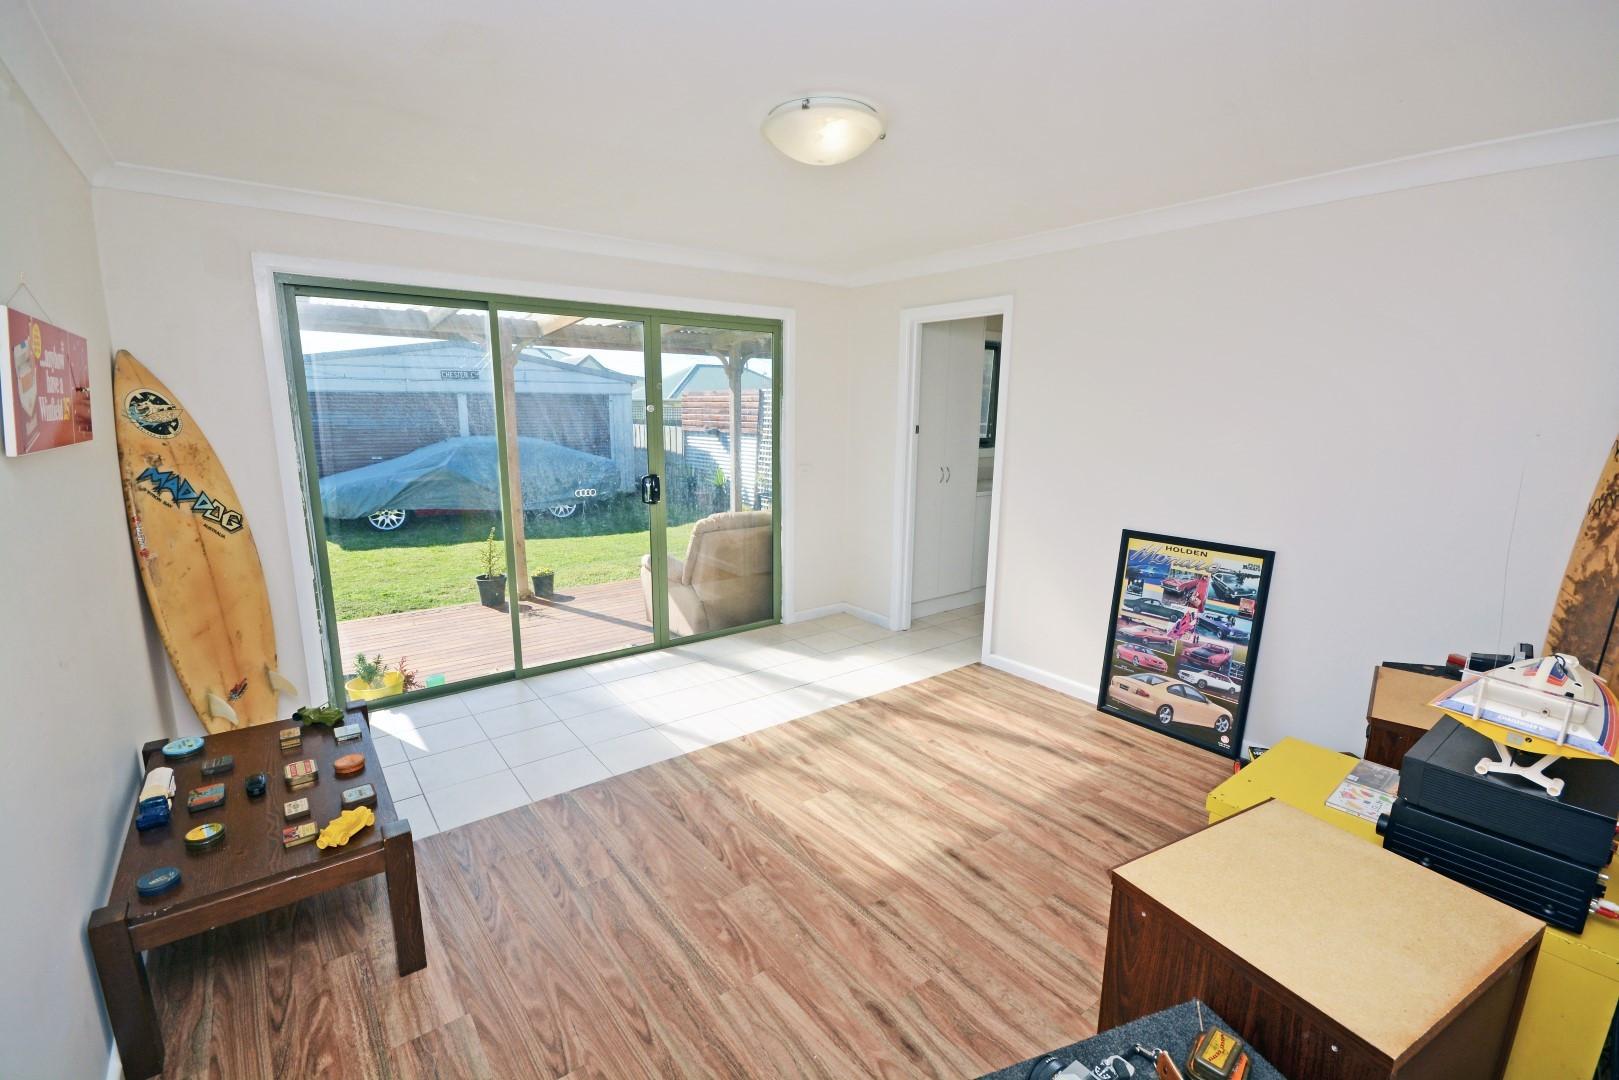 discount hardwood flooring portland of 40 george street portland vic 3305 house for sale allhomes for 74bb22c8e51a8078c7cfcb09ca5b3eb7